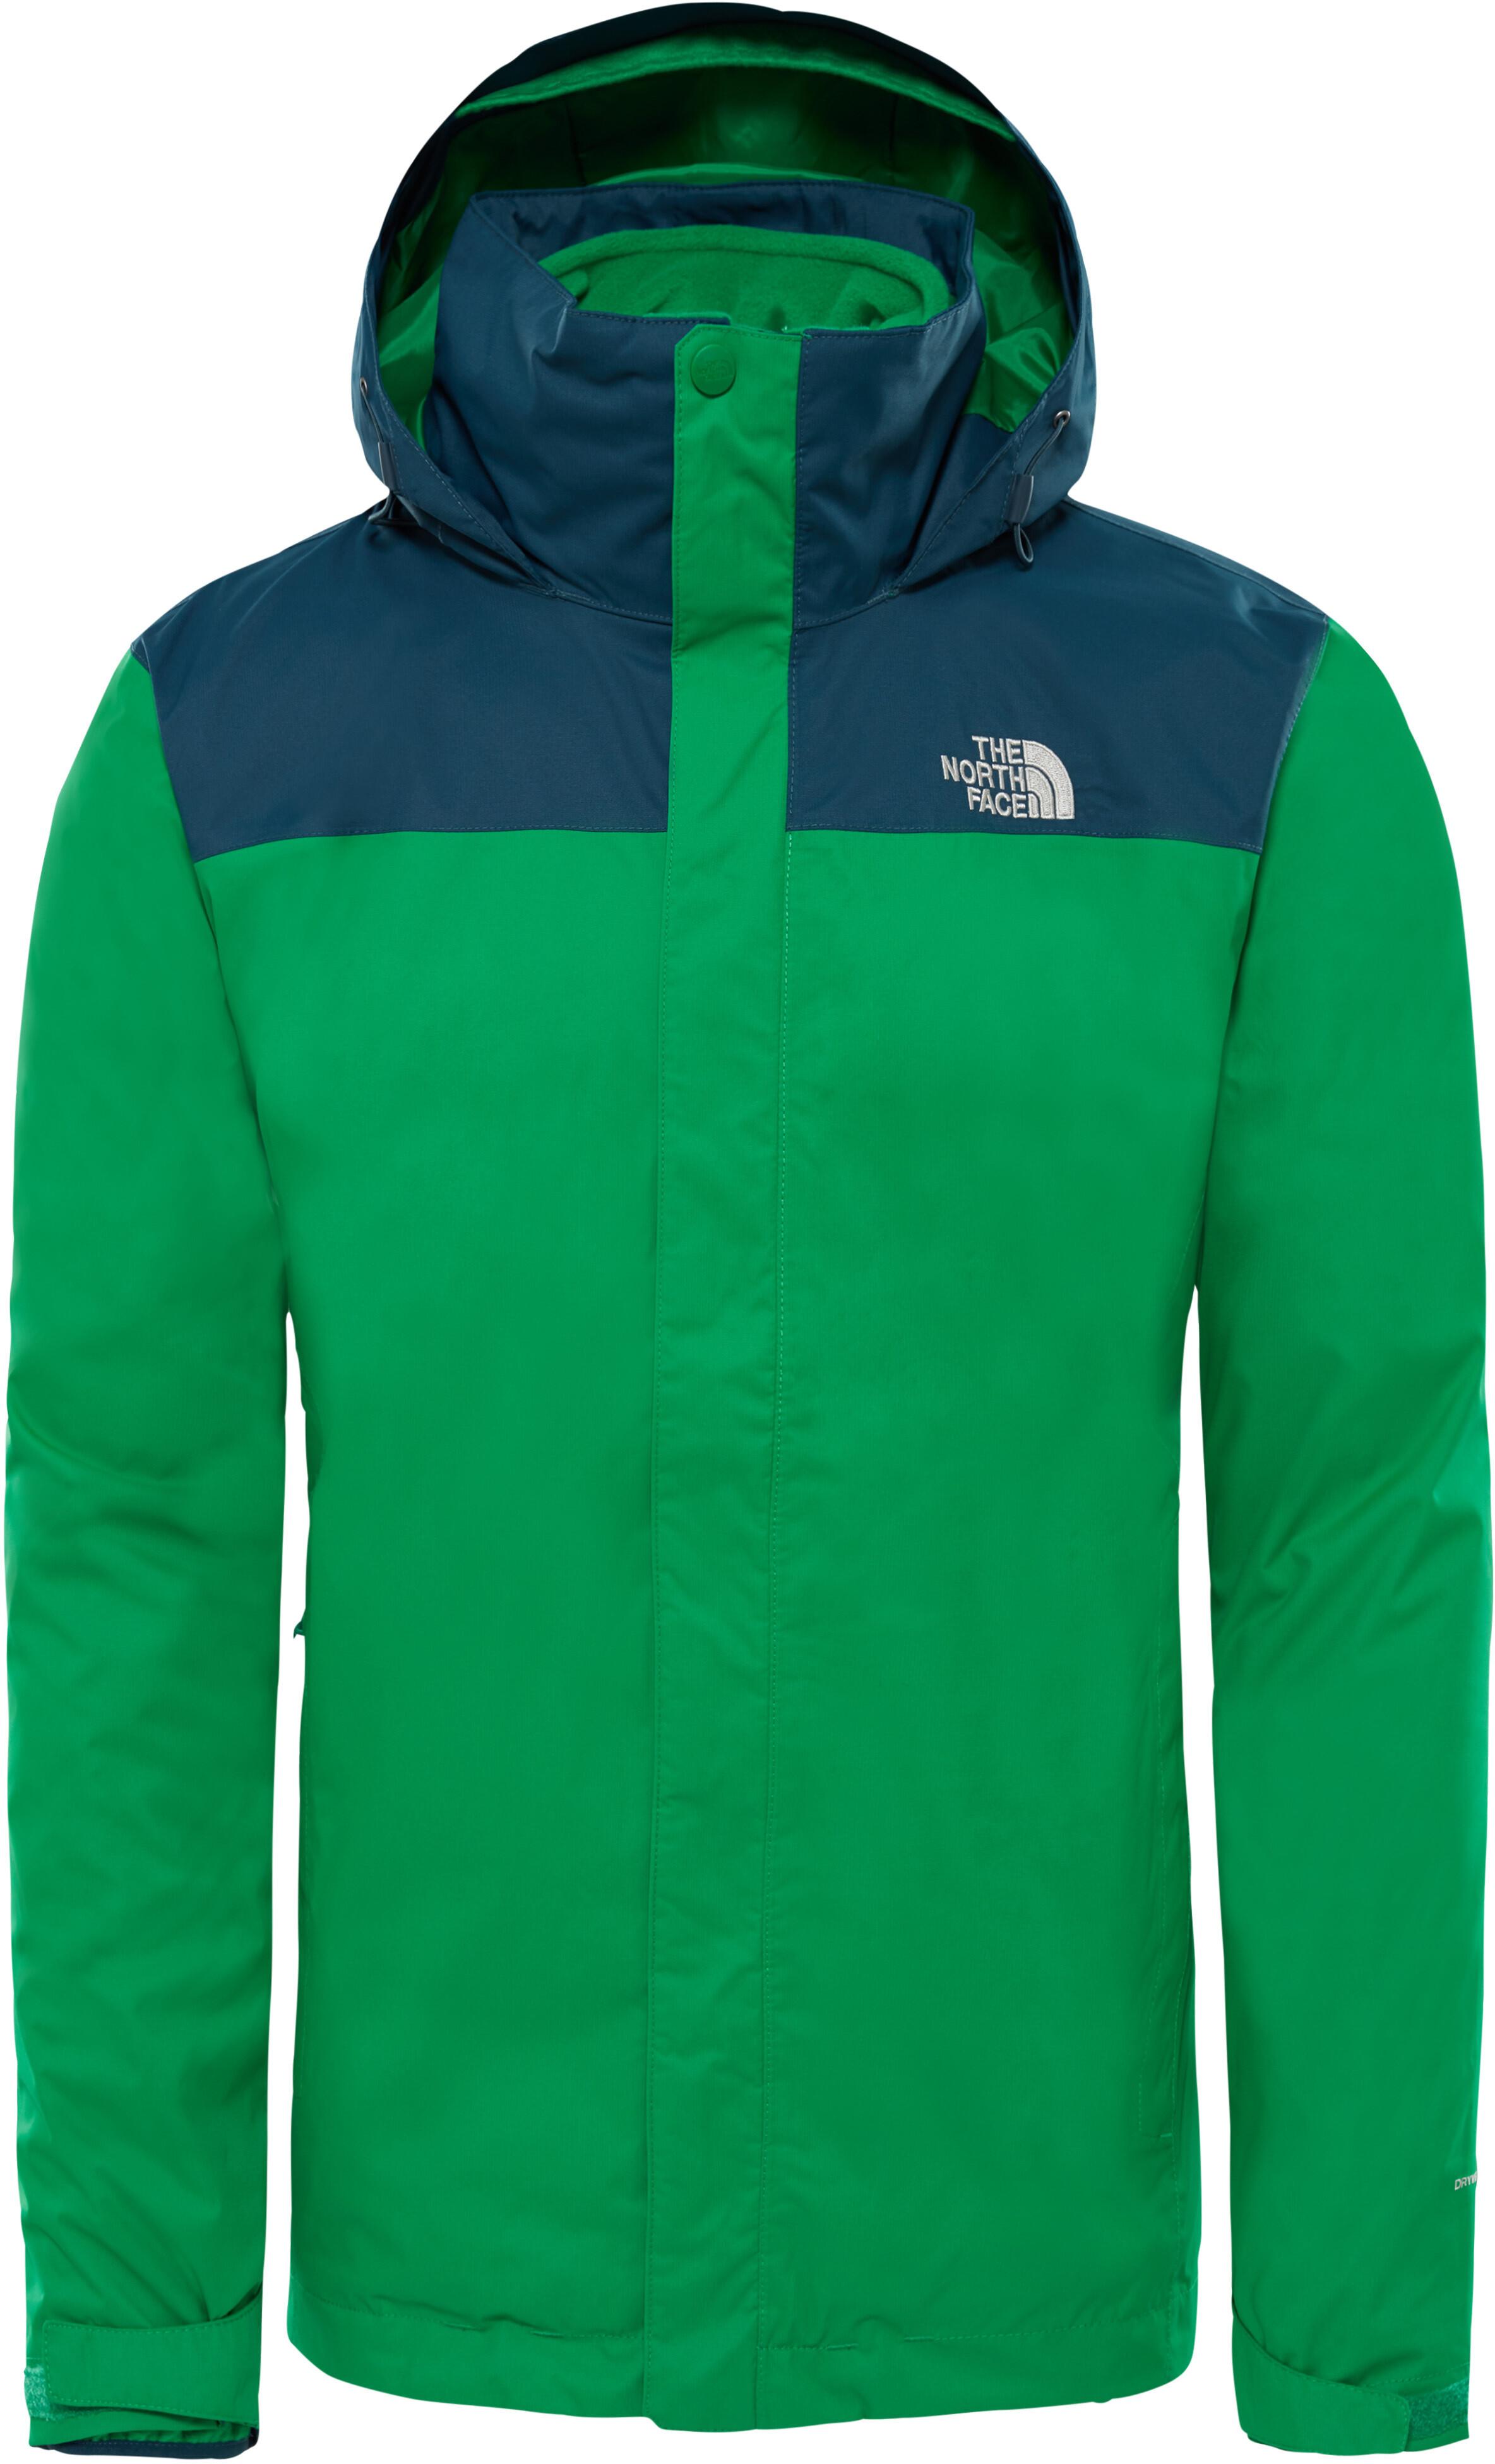 84c1728487 The North Face Evolve II Triclimate Jacket Herren primary green/kodiak blue